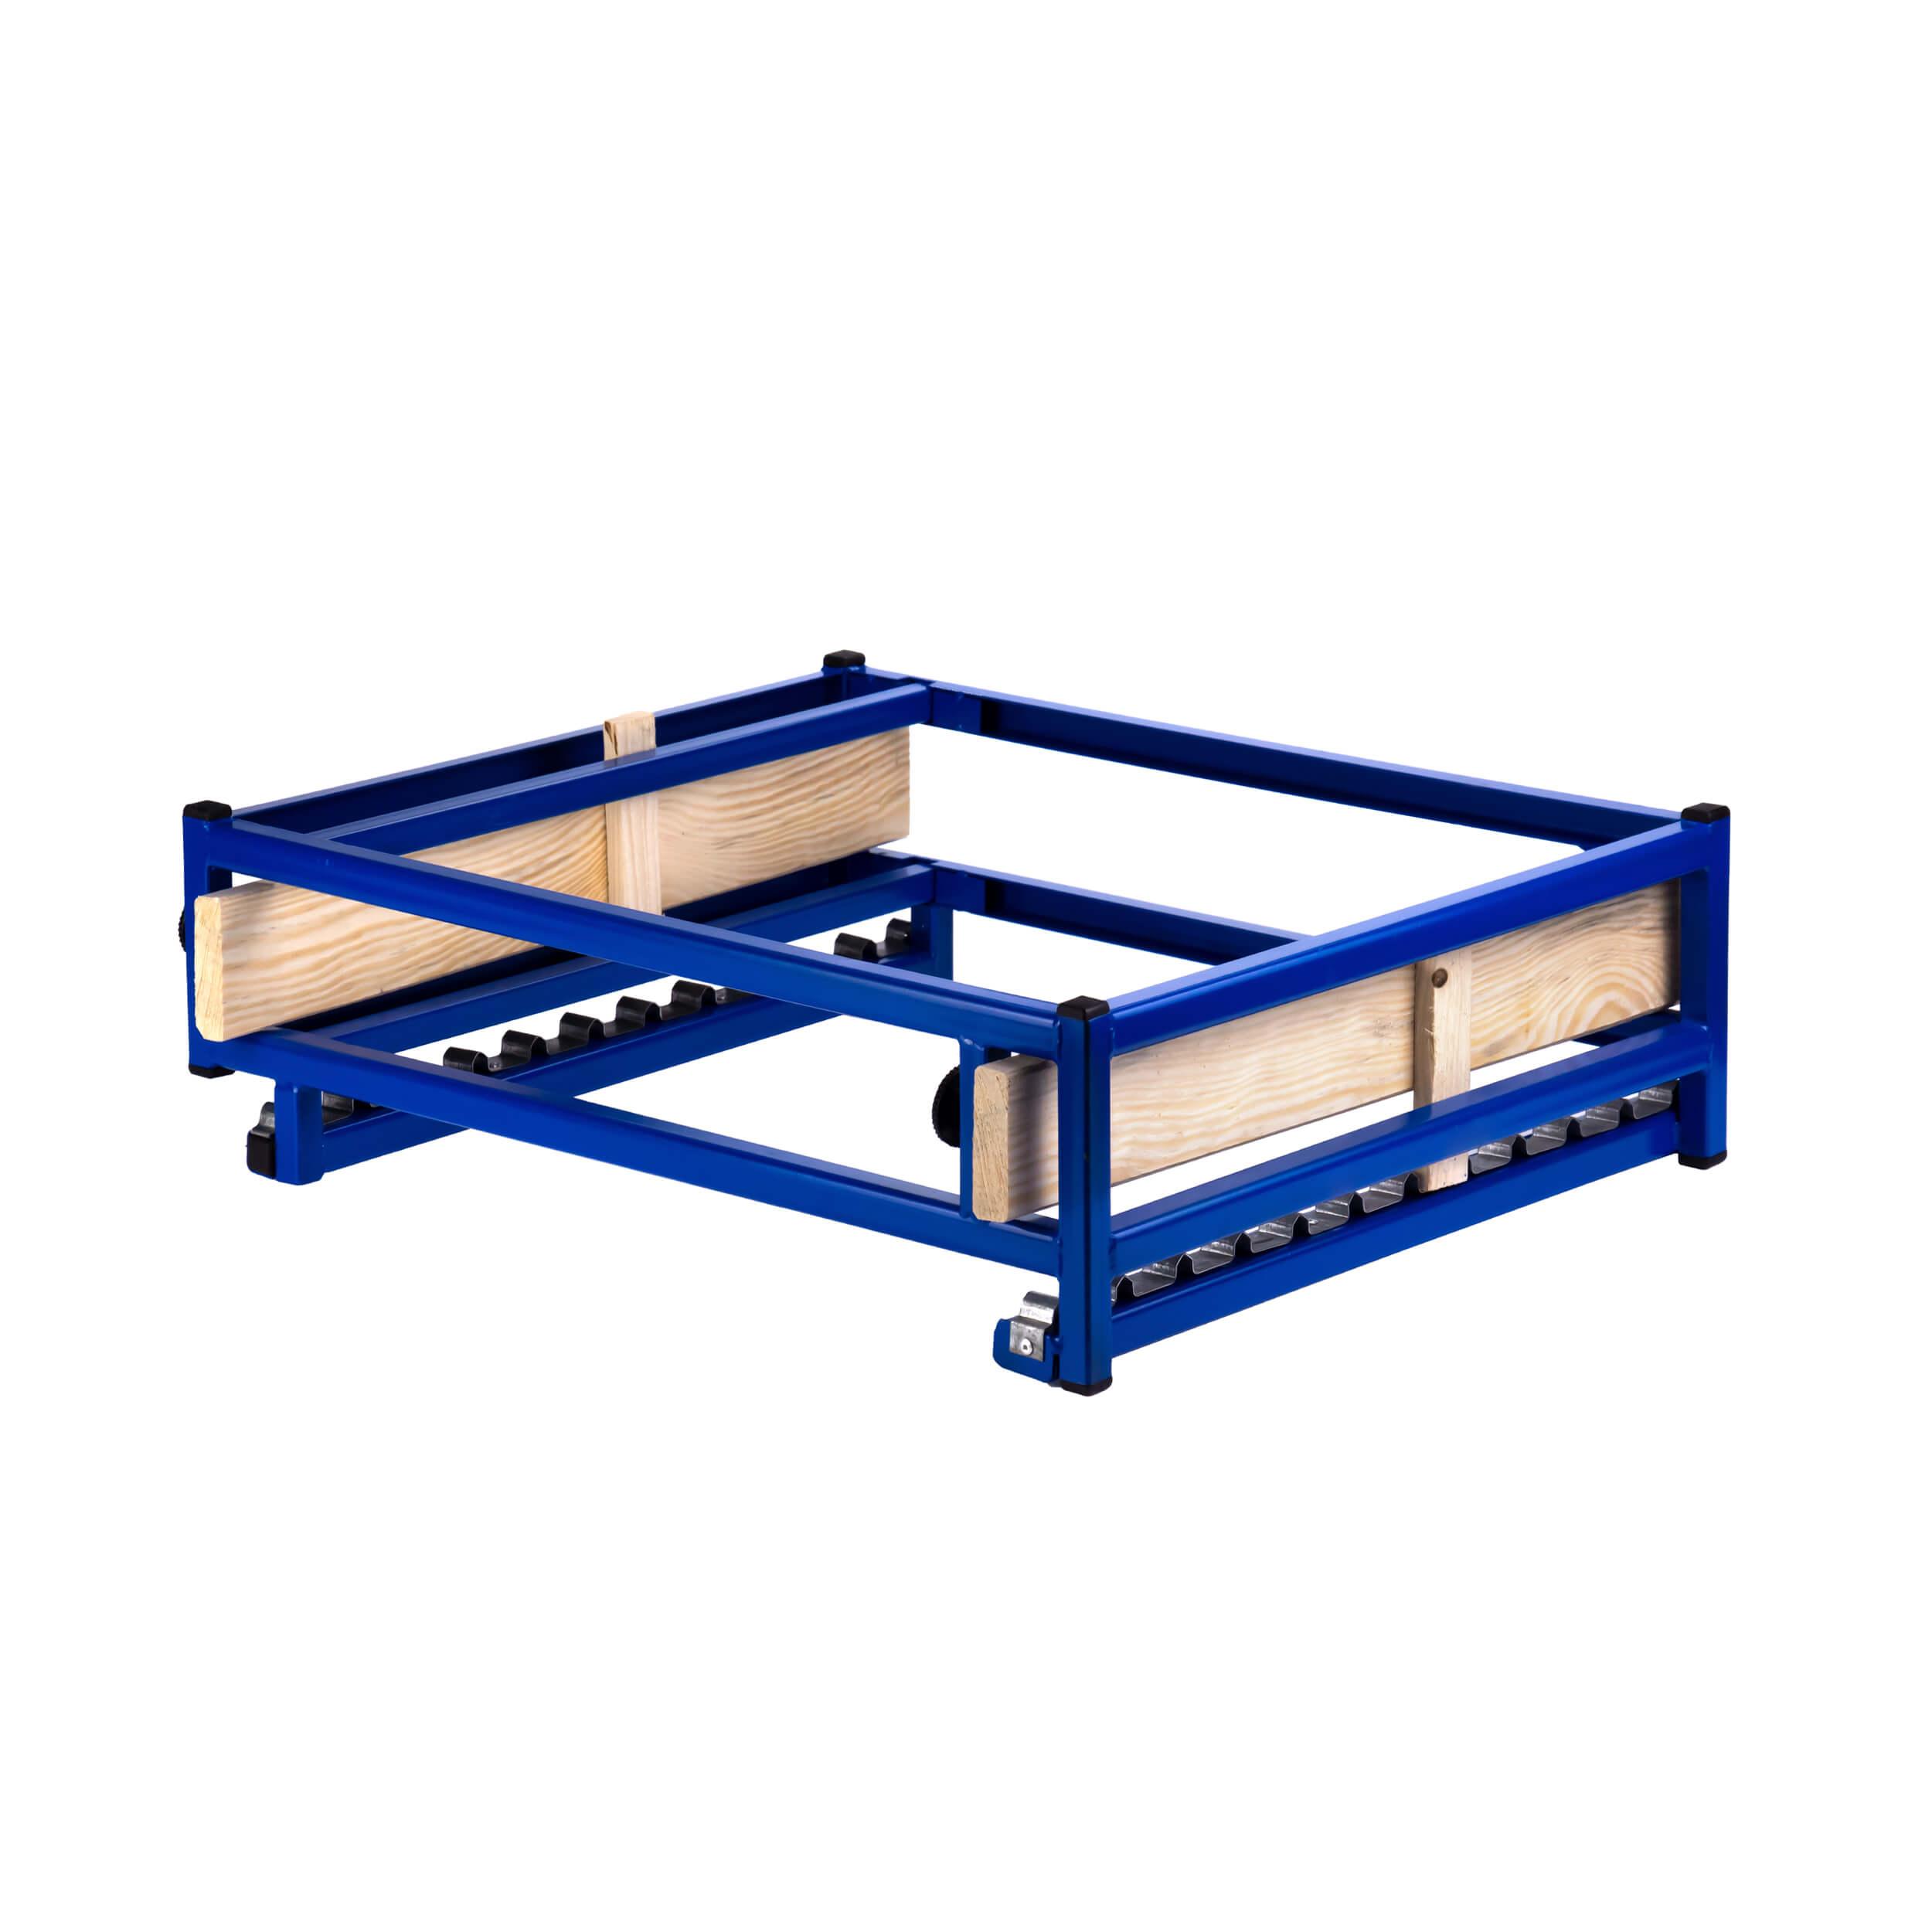 Кондуктор приспособление для сколачивания рамок (на 10 рамок) фото